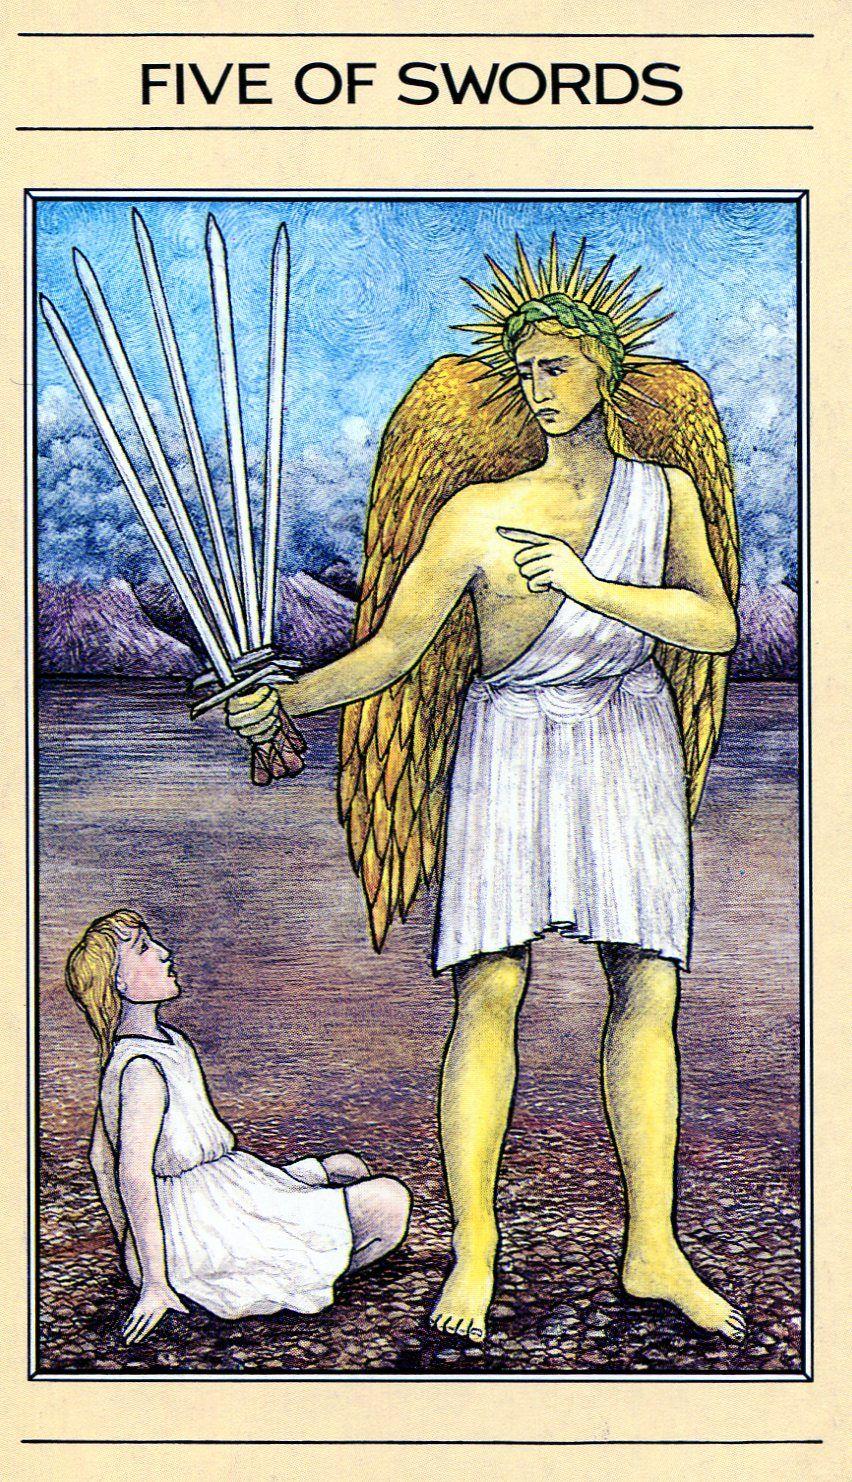 Five Of Swords - Mythic Tarot